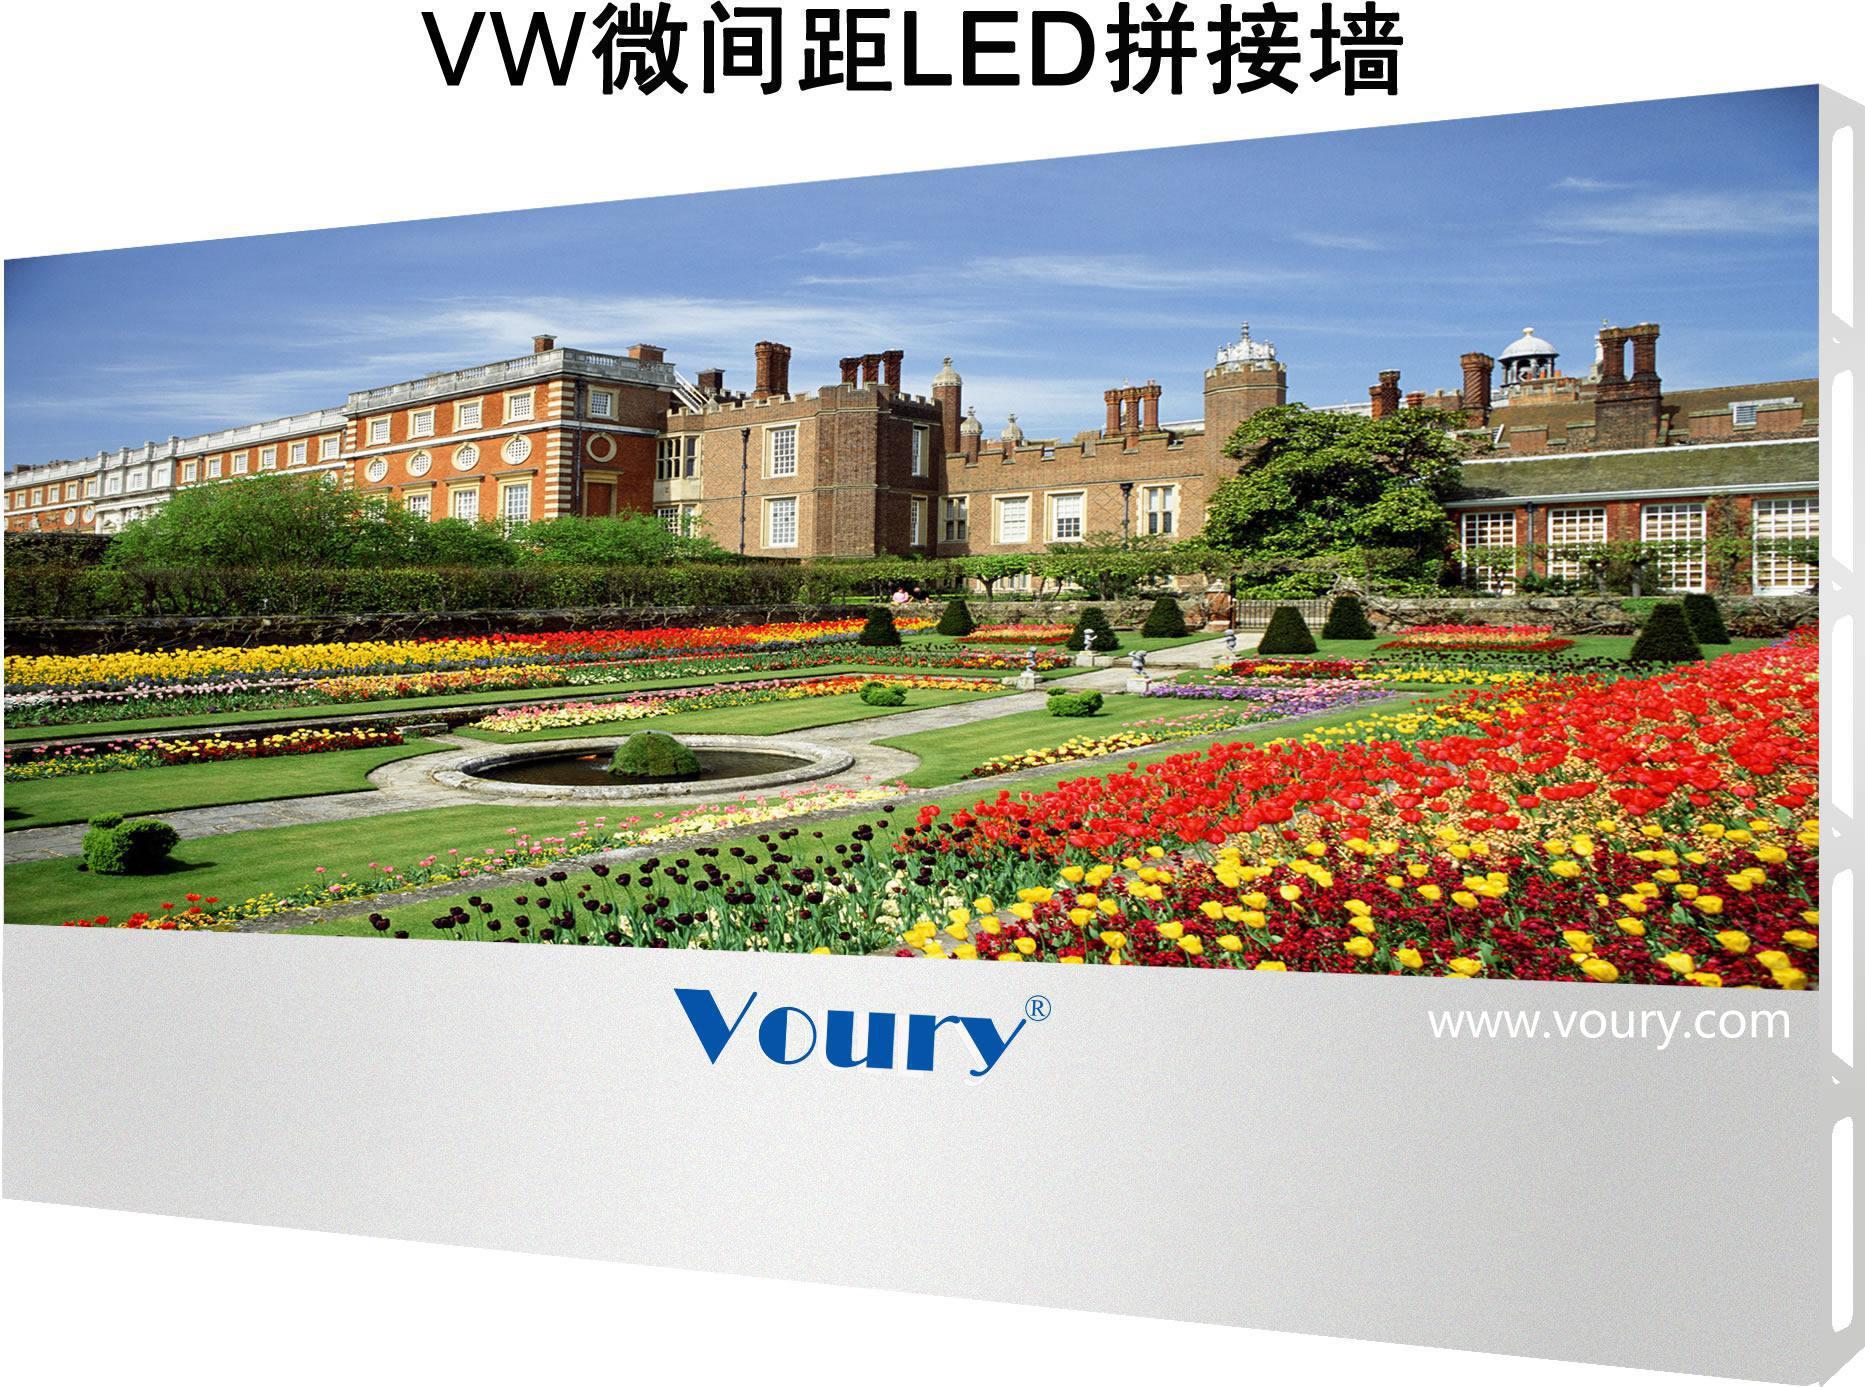 VOURY卓华光电P1.0微间距LED全彩屏小间距LED显示专家LED知名品牌